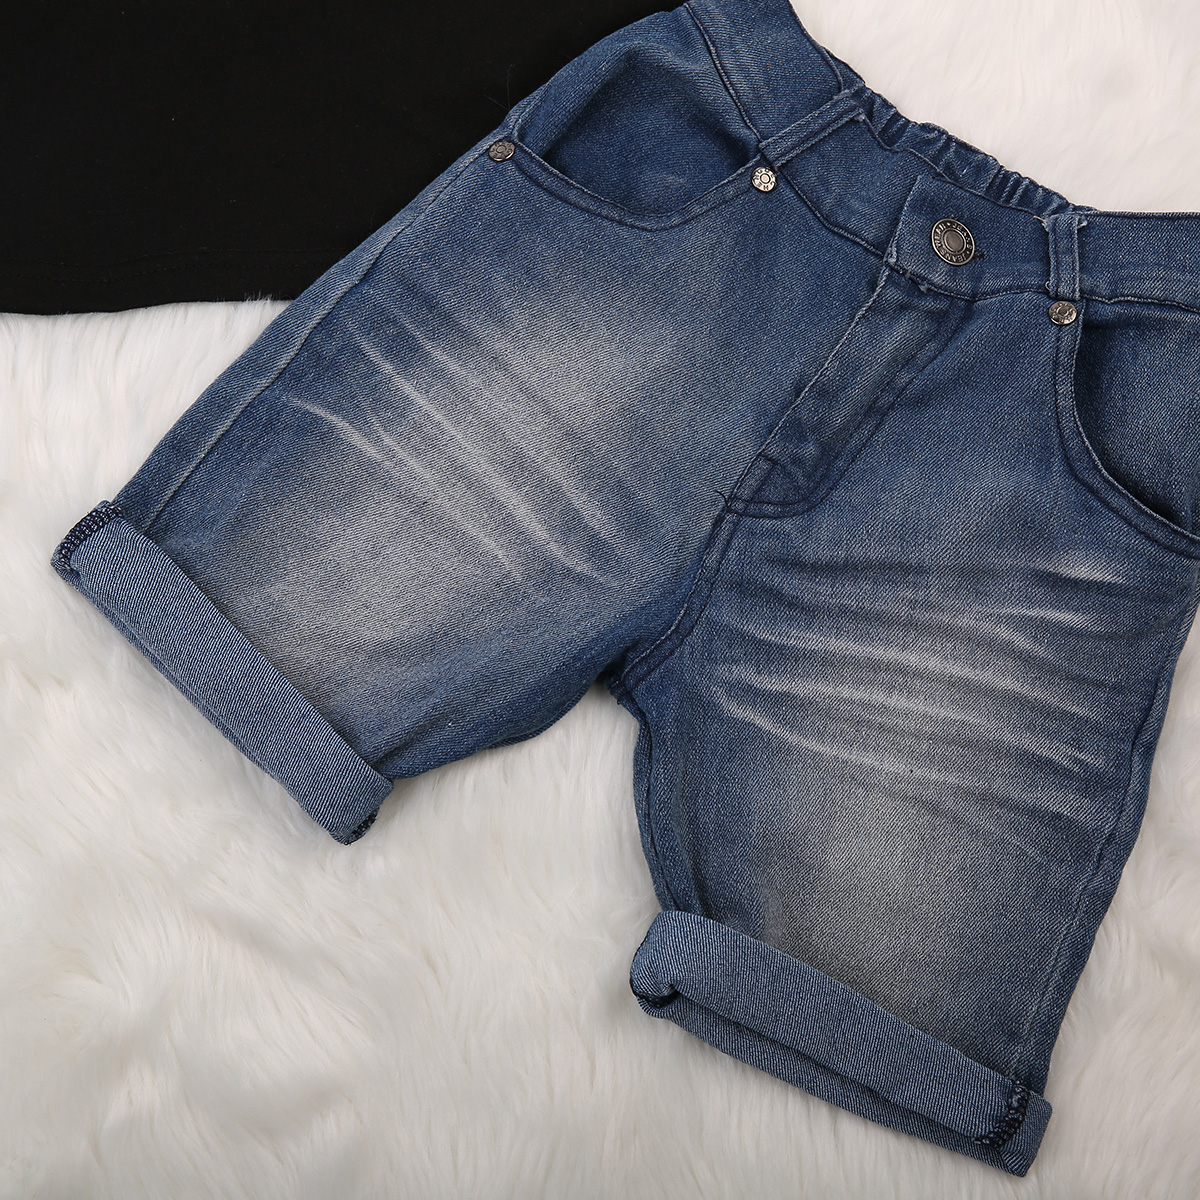 2017-Summer-Kids-Clothes-Mamas-Boy-Short-Sleeve-Cotton-T-shirt-TopsJean-Shorts-Denim-Pant-2PCS-Baby-Boys-Clothing-Set-1-6Y-4